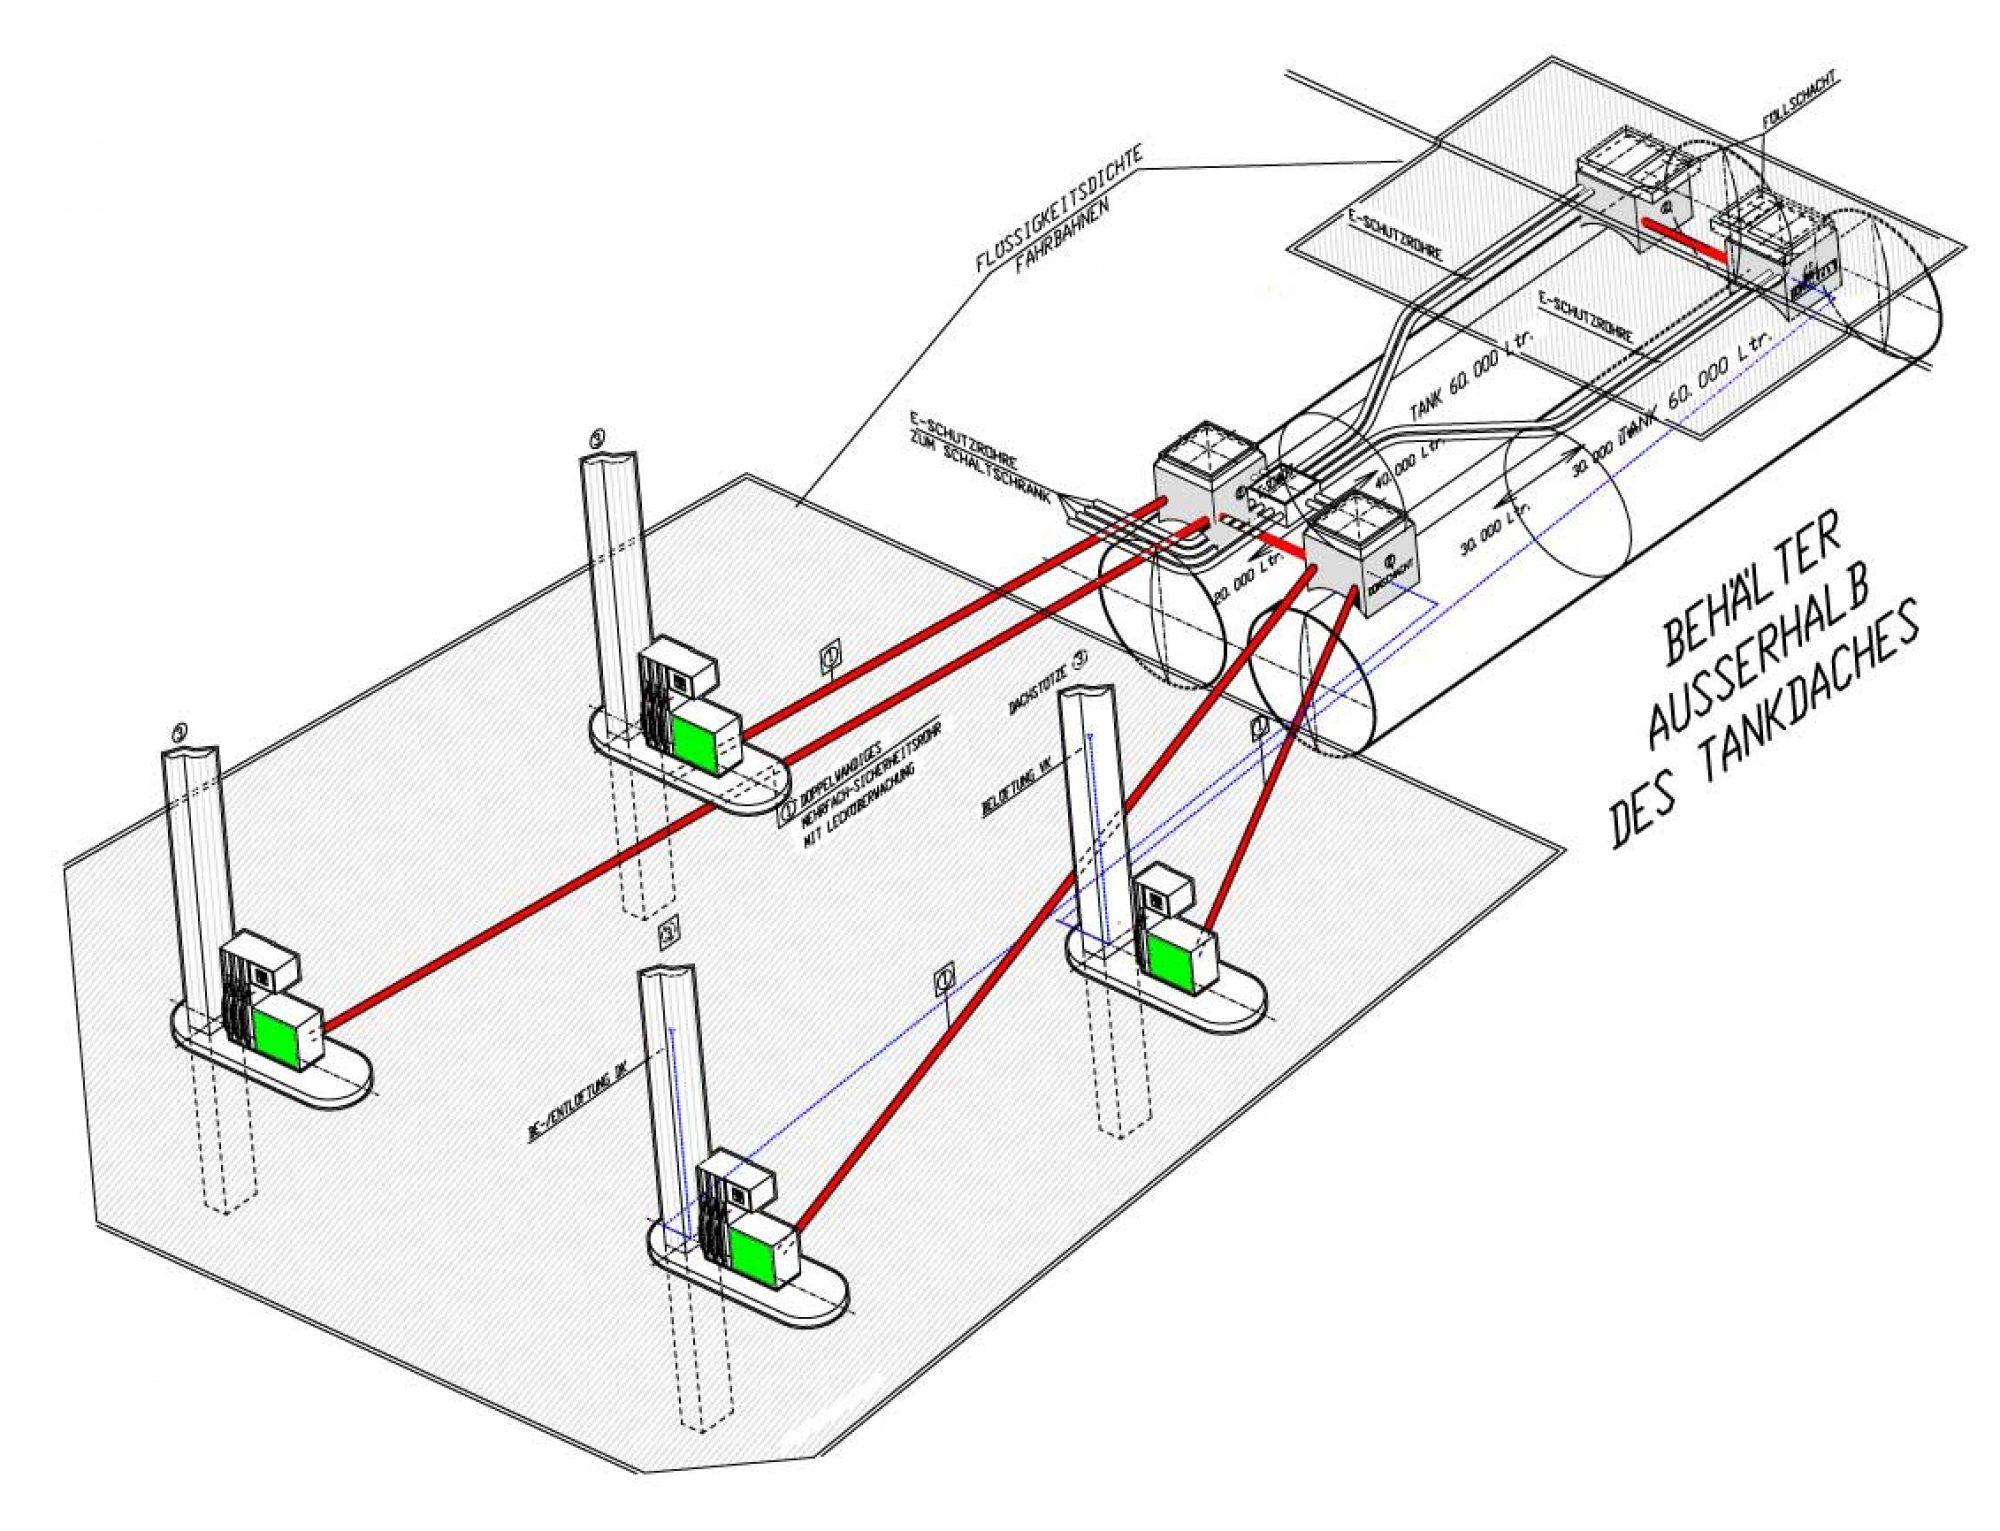 Löw Tanktechnik